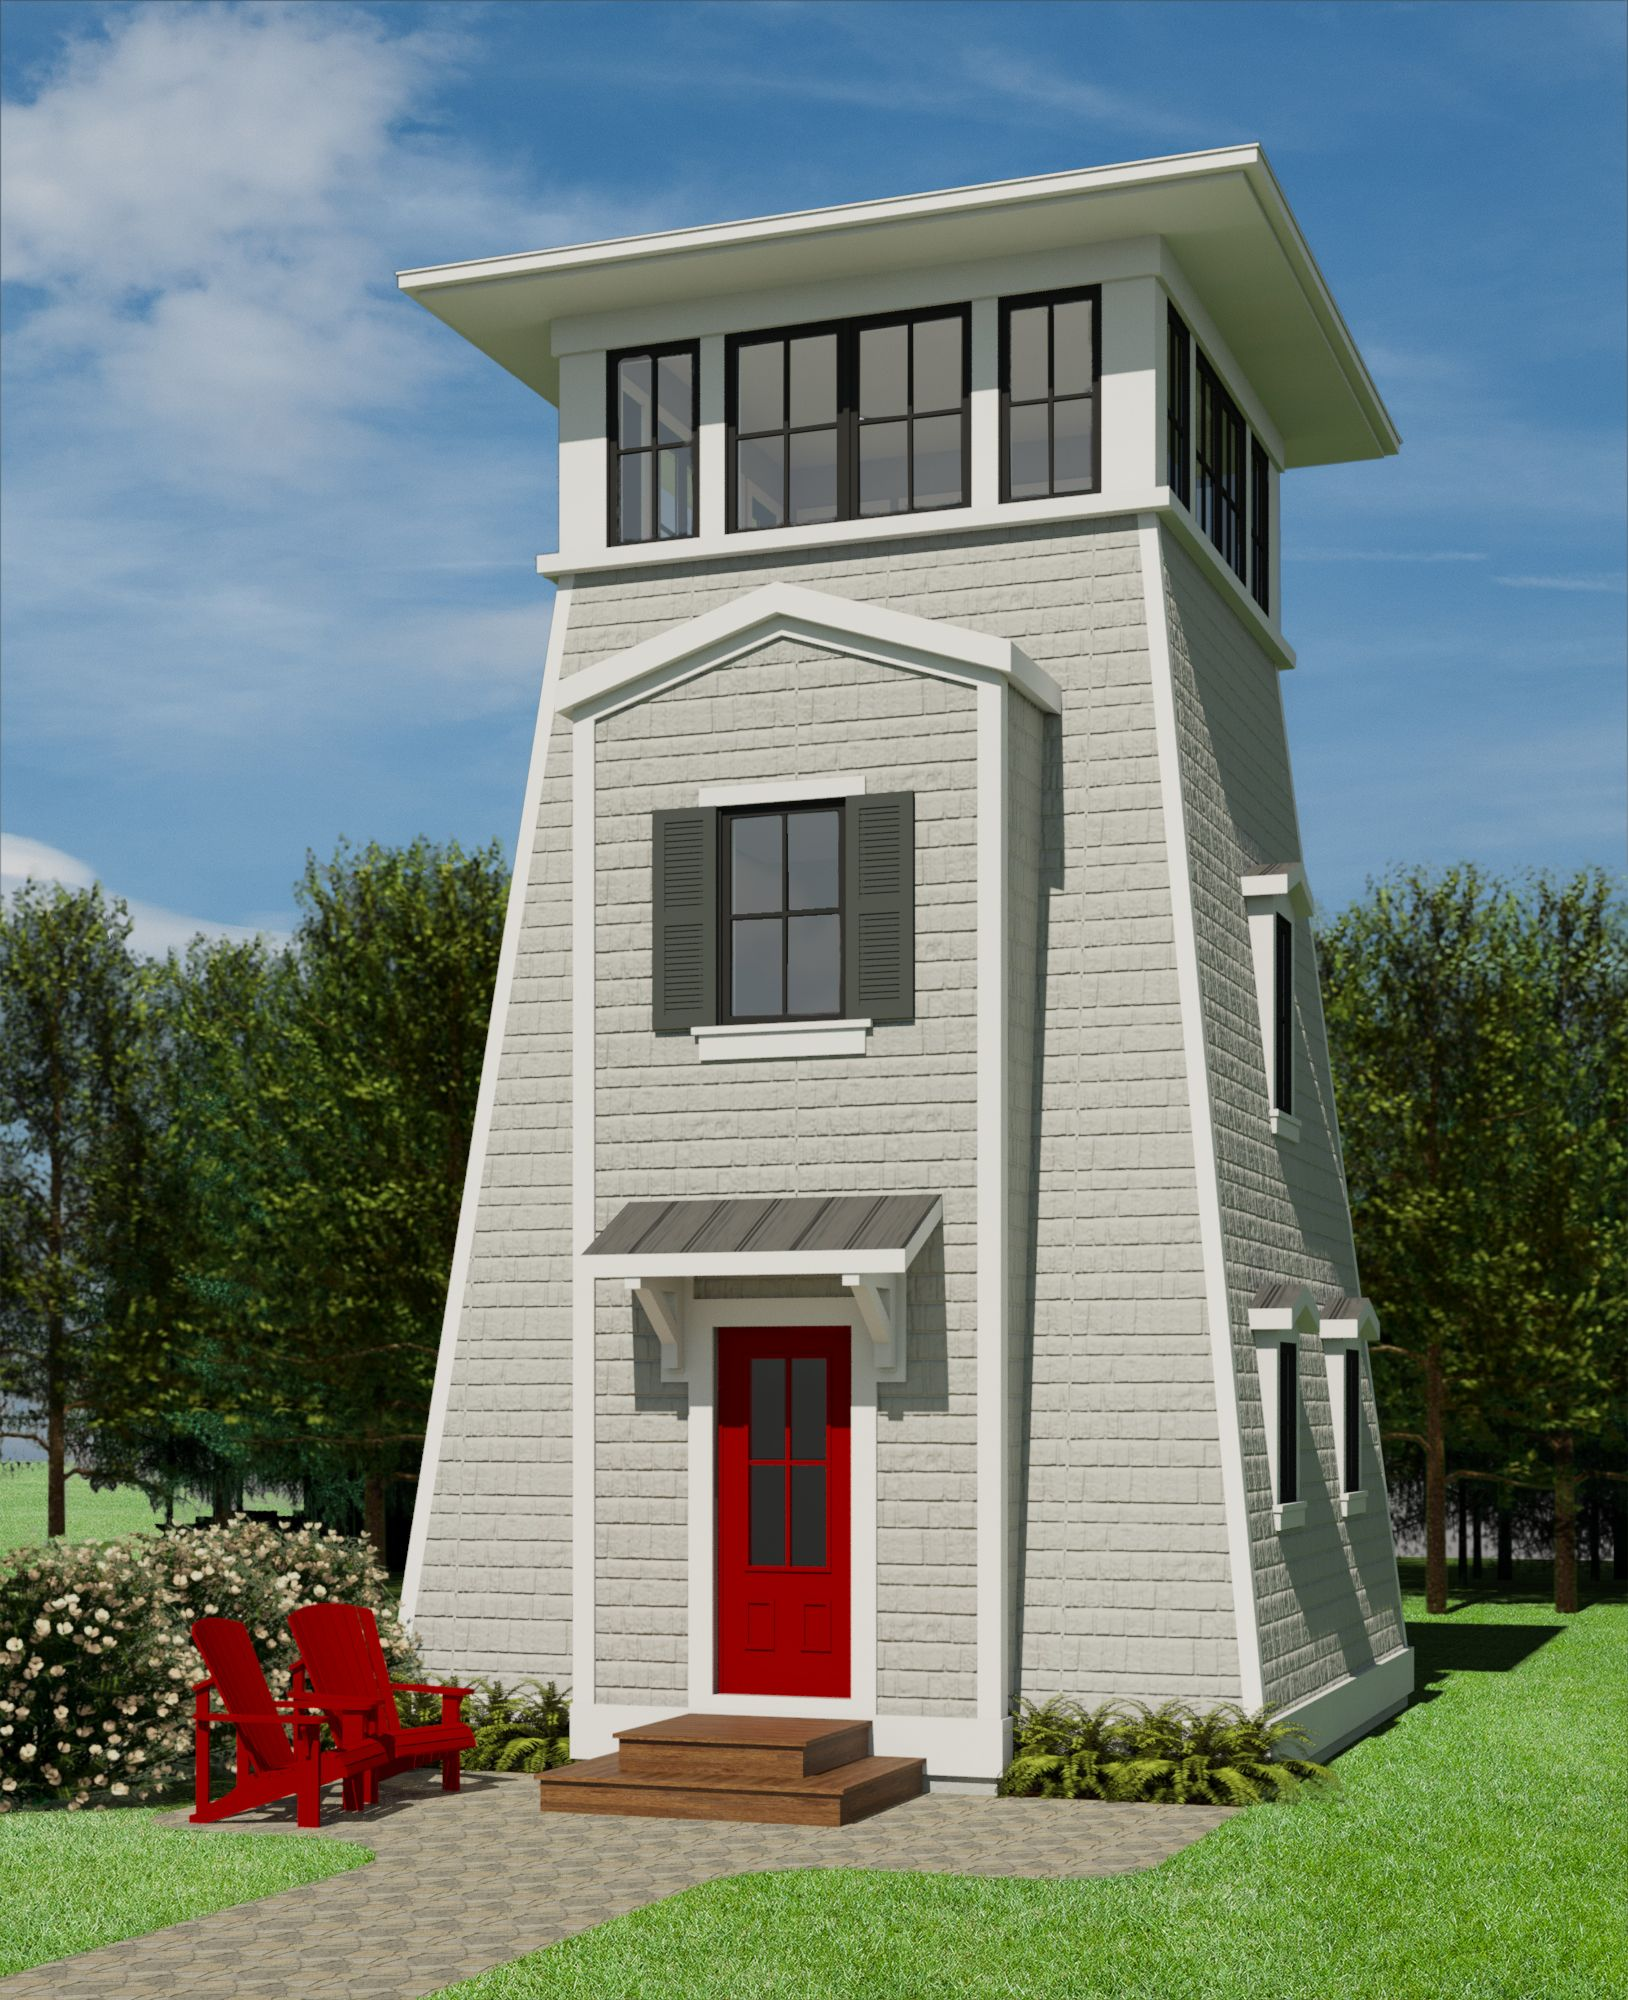 Nova Scotia-649 Brooke' House Small Plans